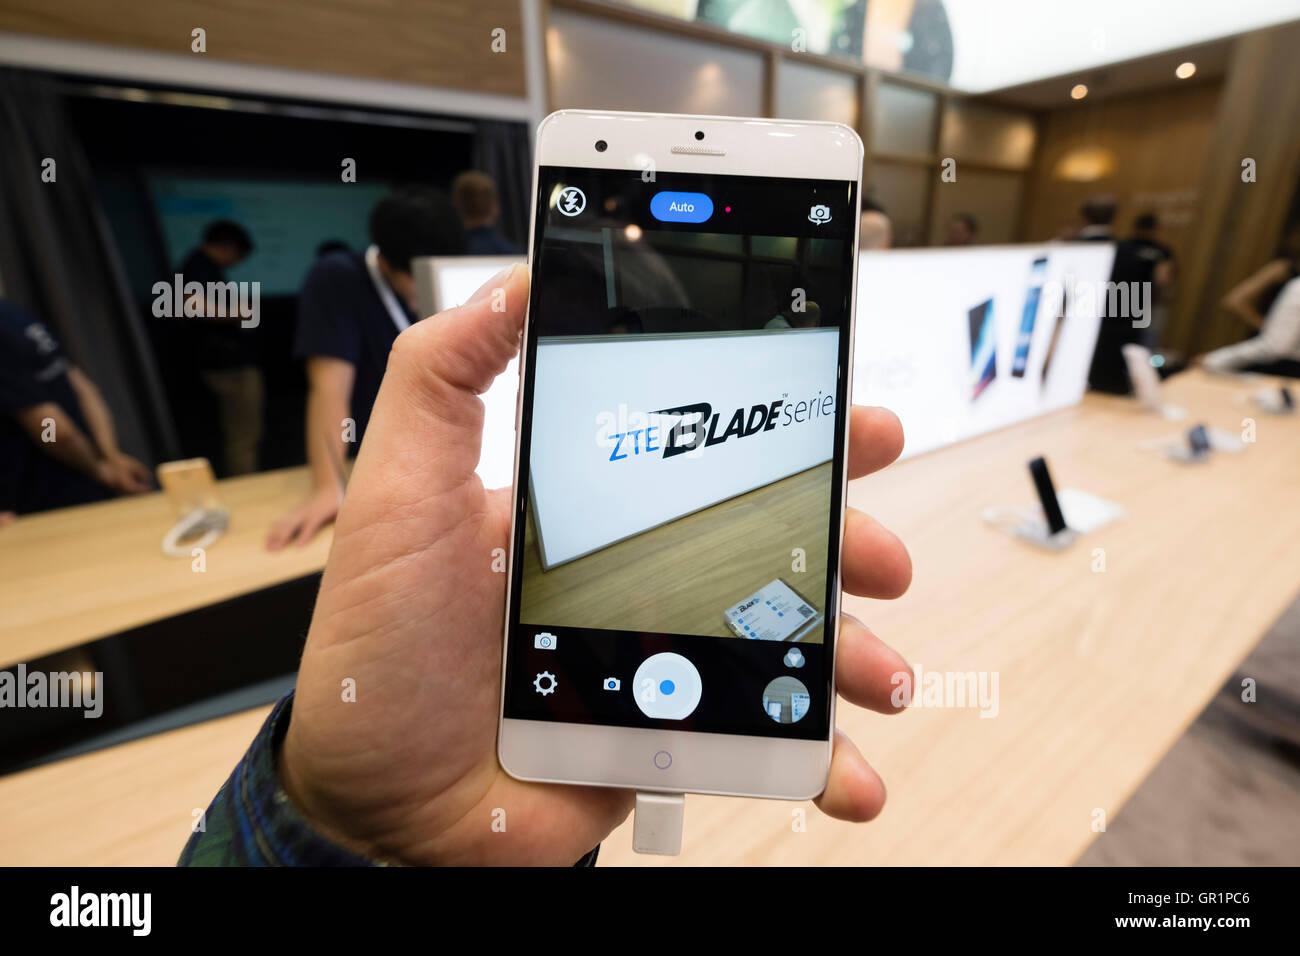 ZTE Blade smart phone on display at 2016  IFA (Internationale Funkausstellung Berlin), Berlin, Germany - Stock Image